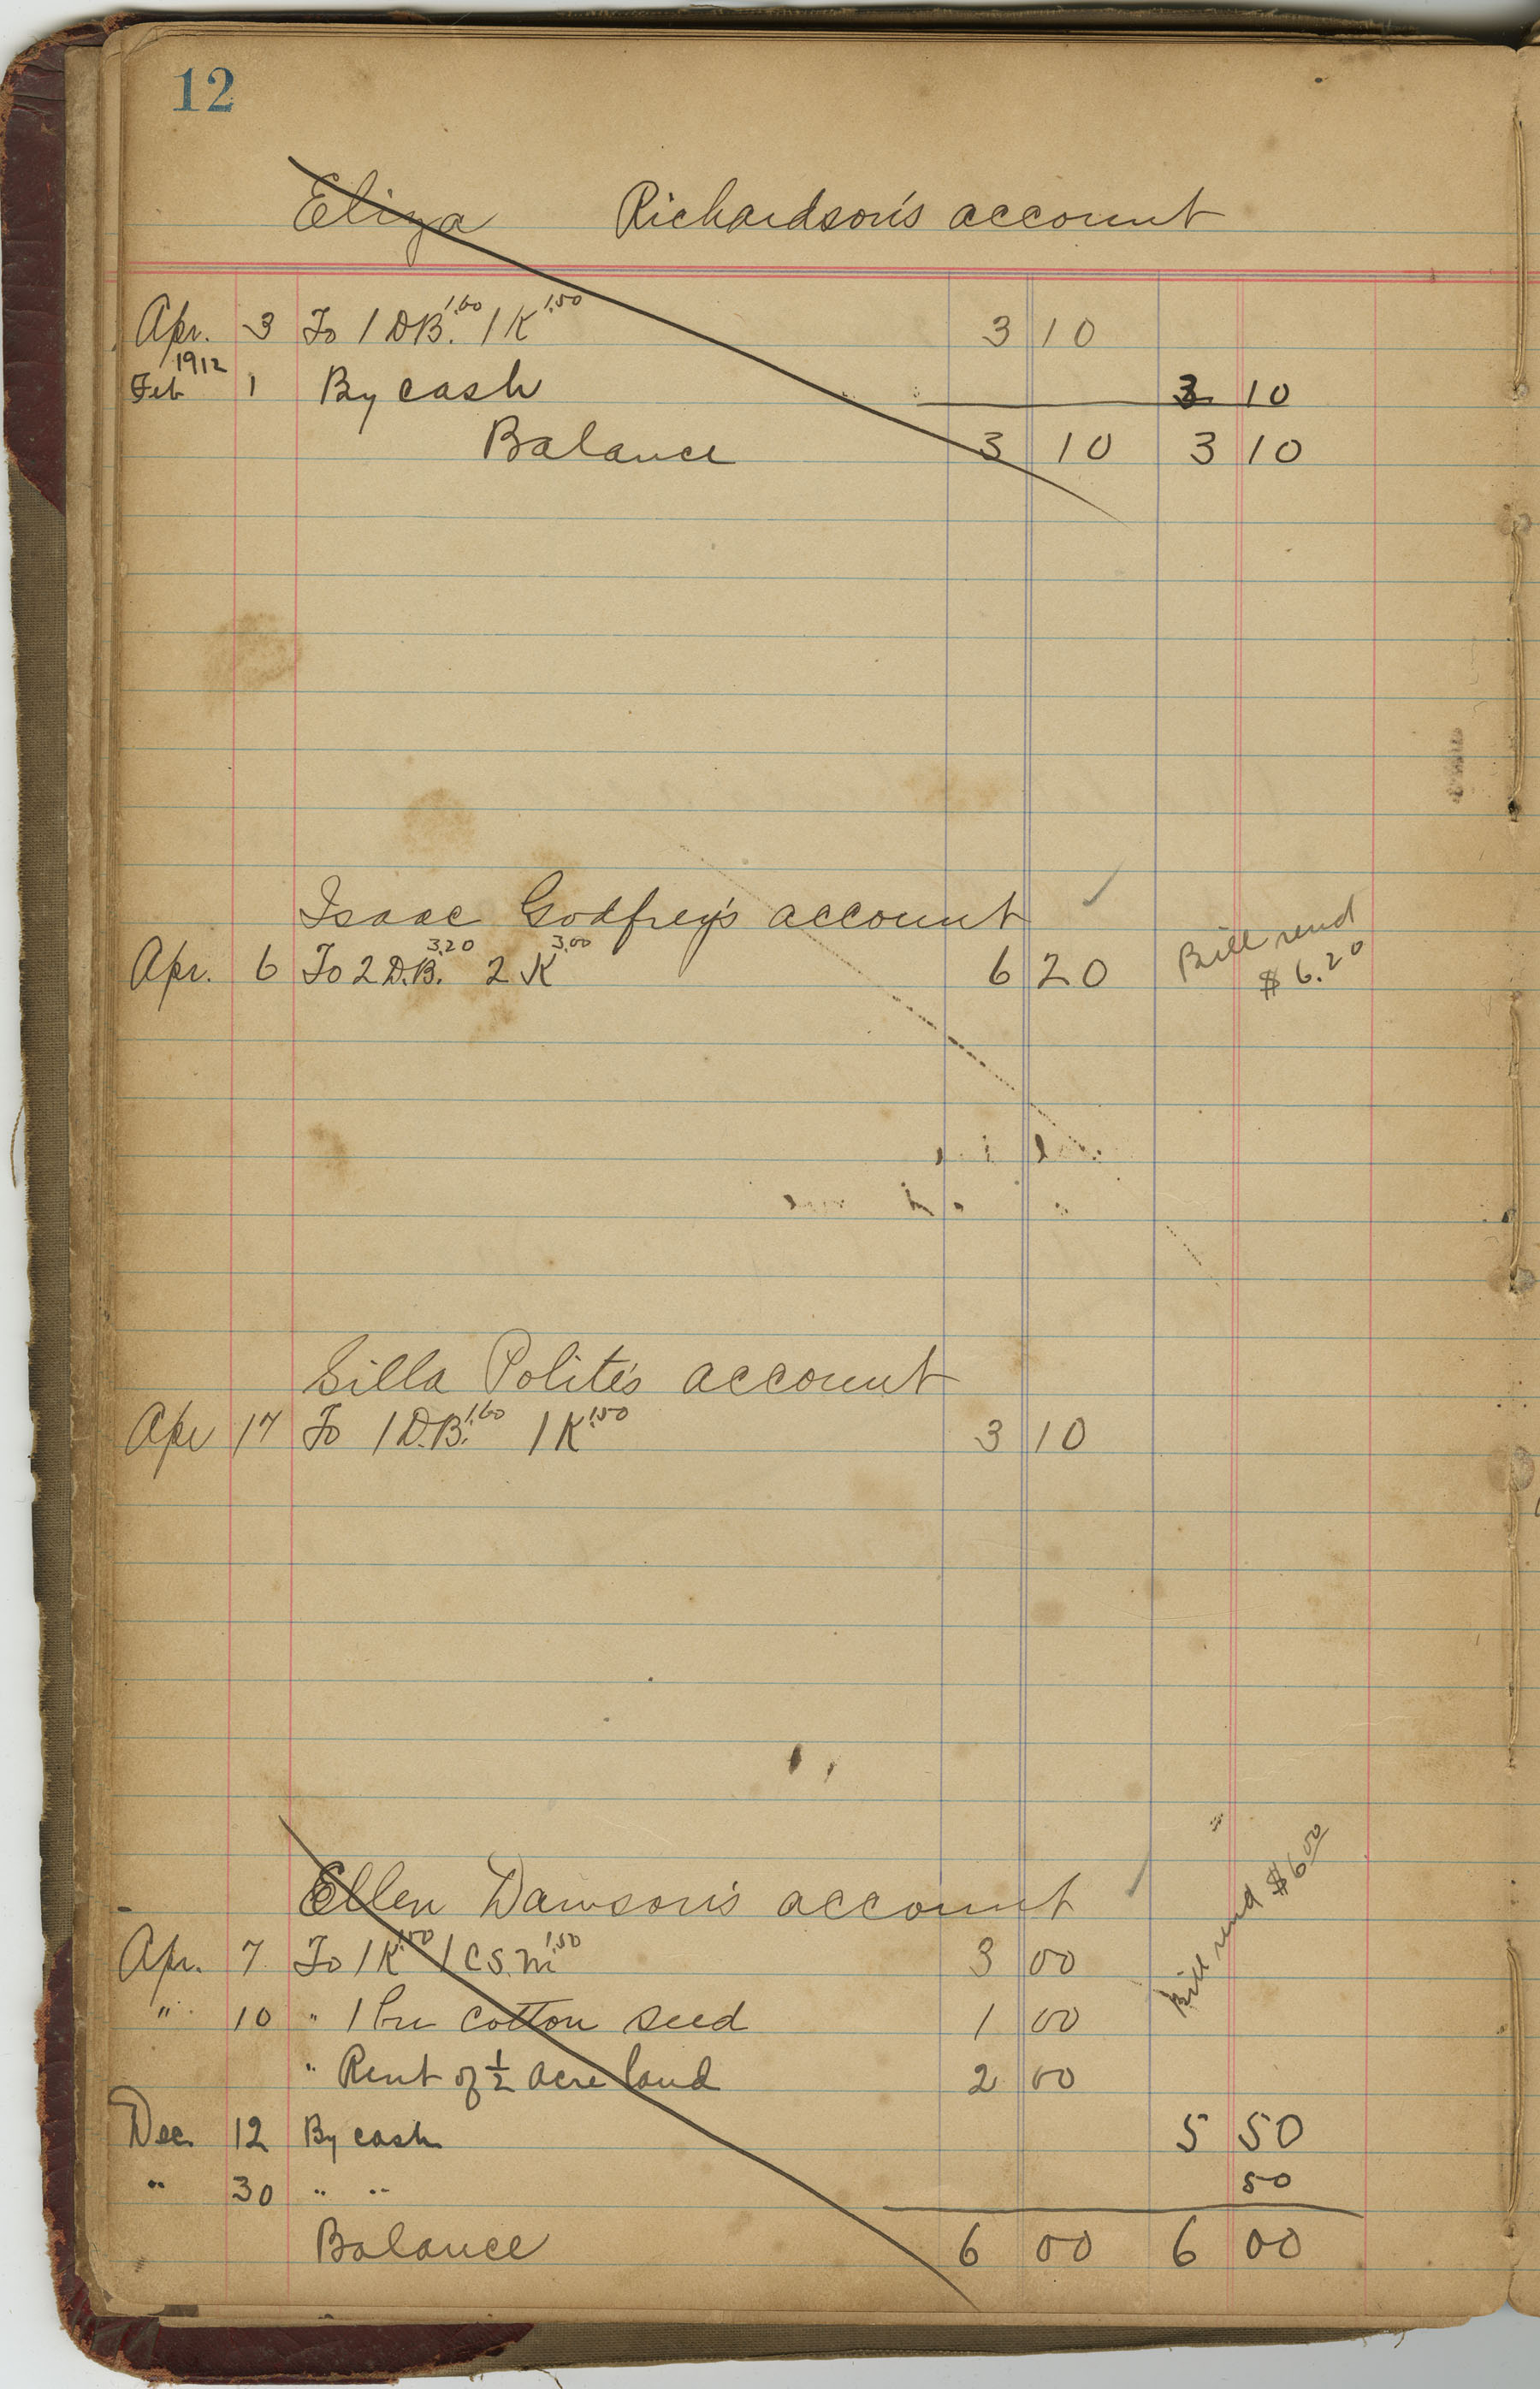 McLeod Plantation Journal, Page 31